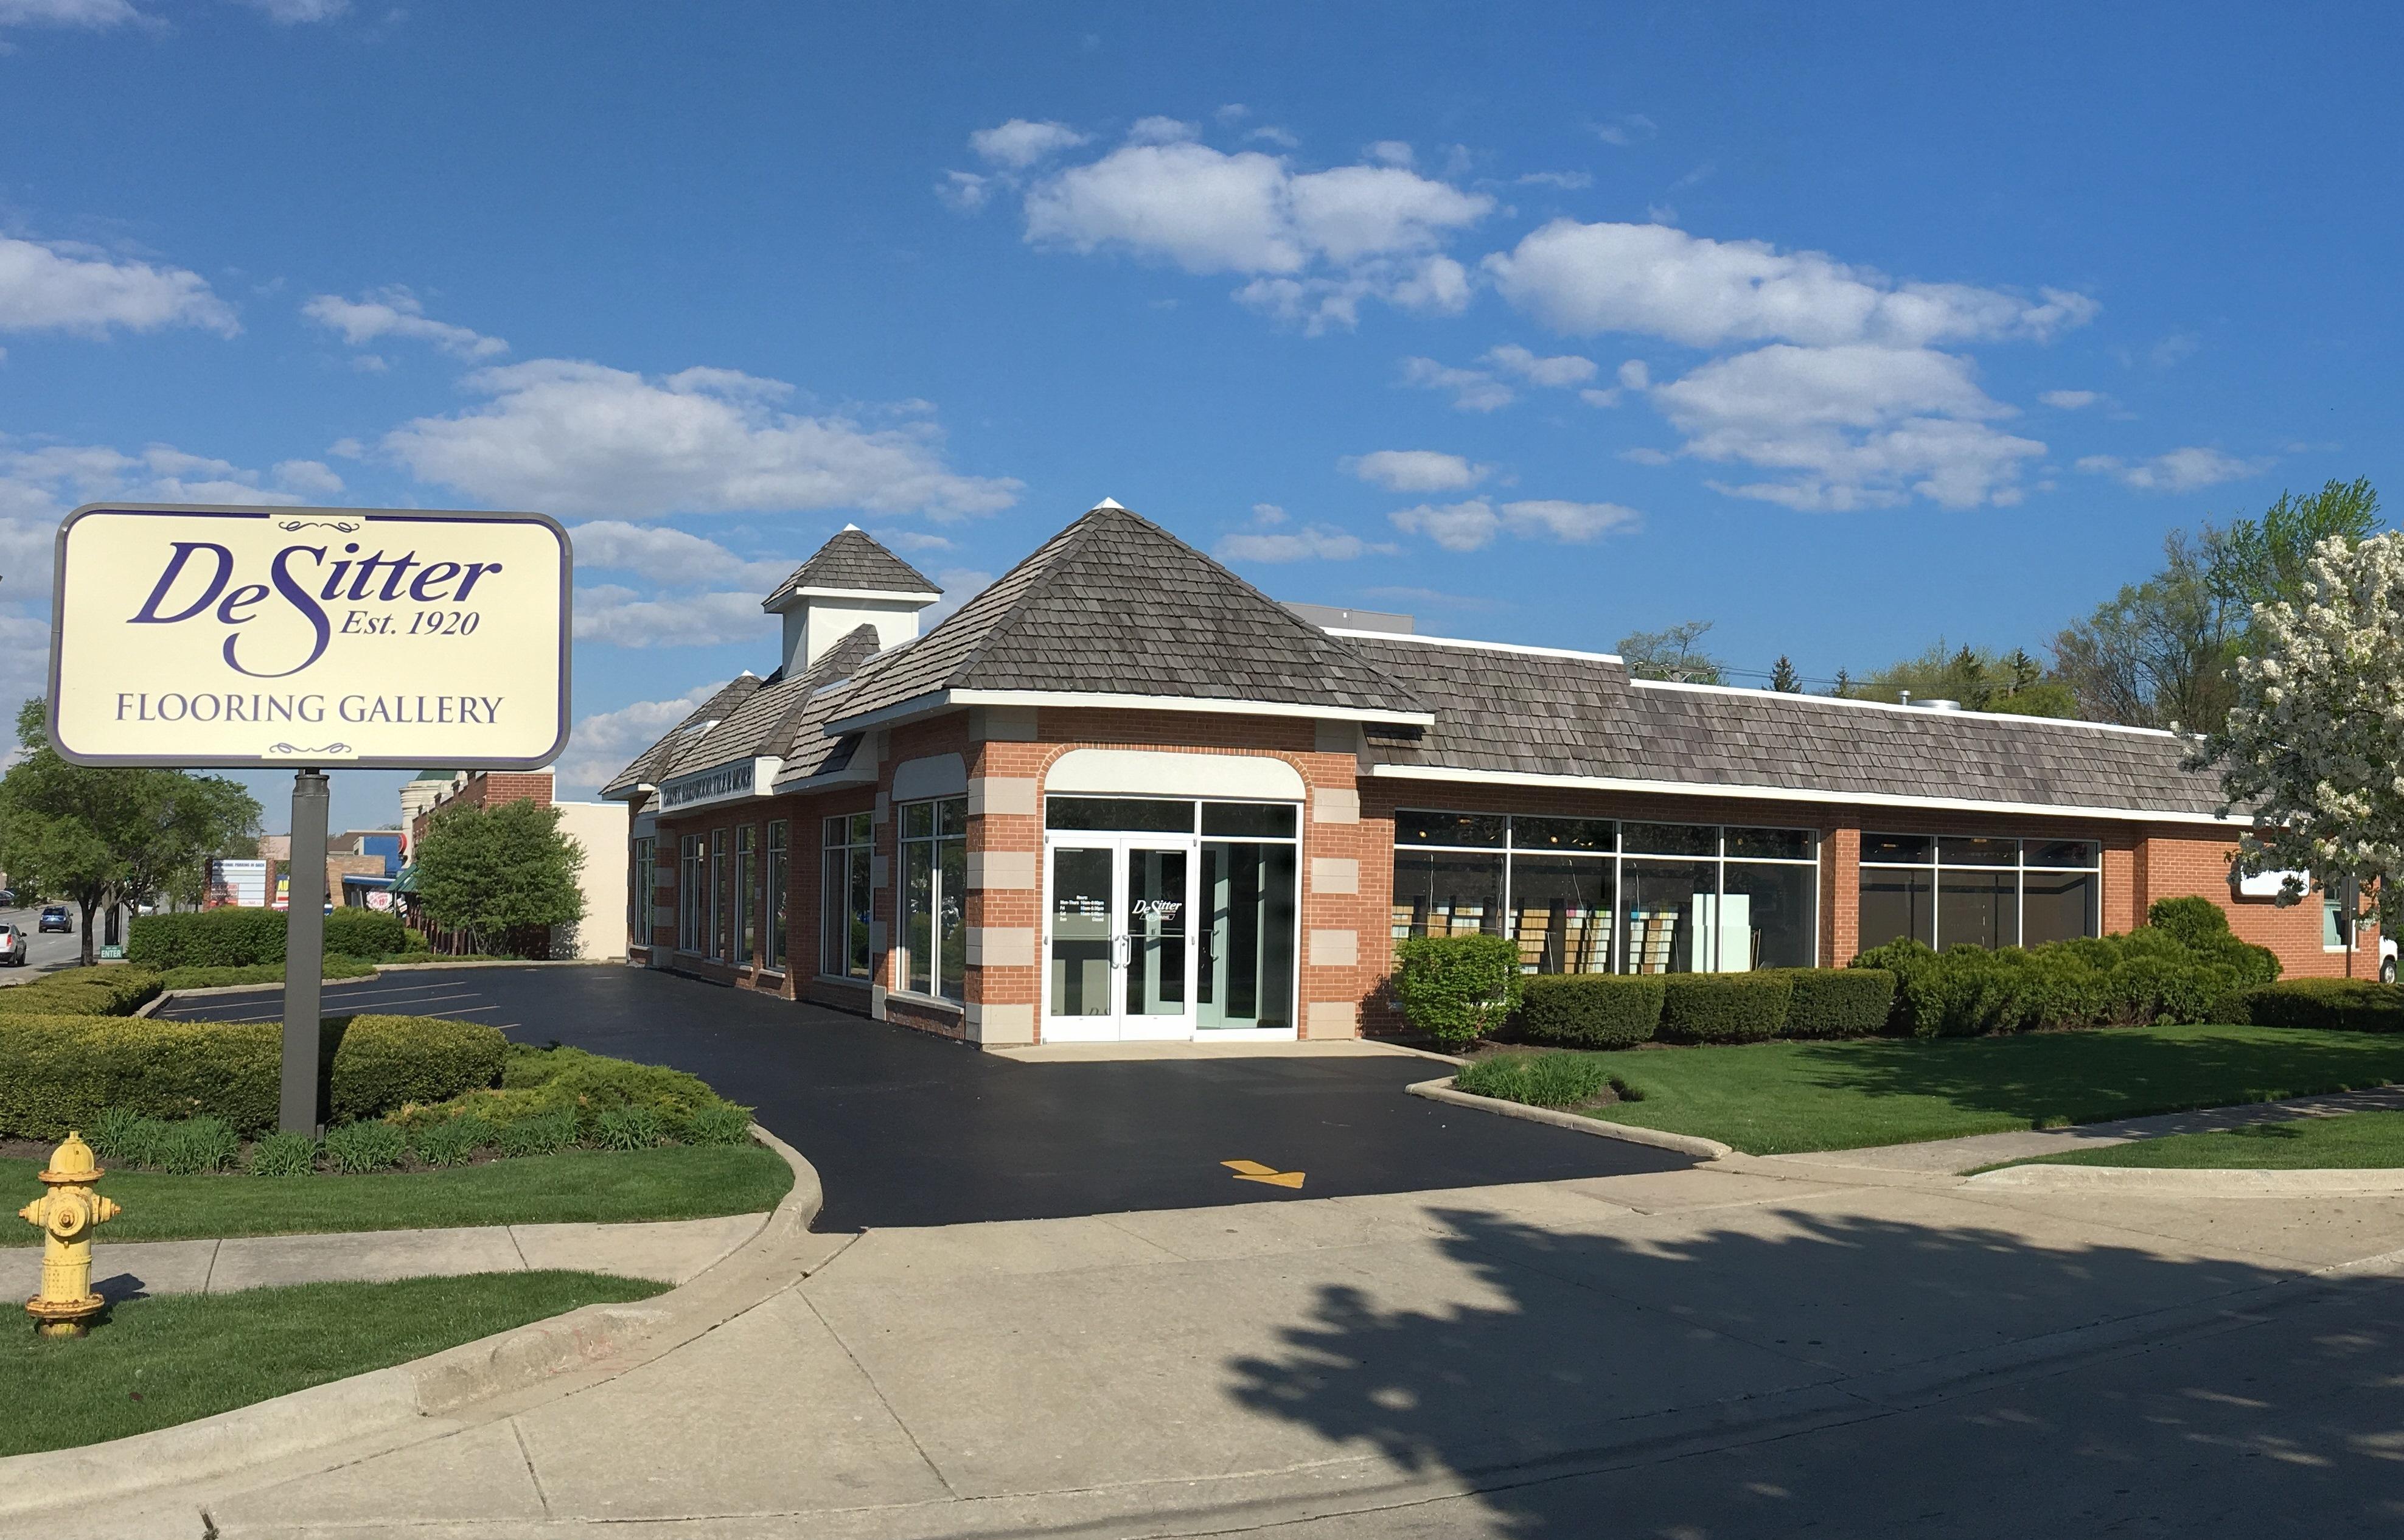 Desitter Flooring - 444 Roosevelt Rd, Glen Ellyn, IL 60137